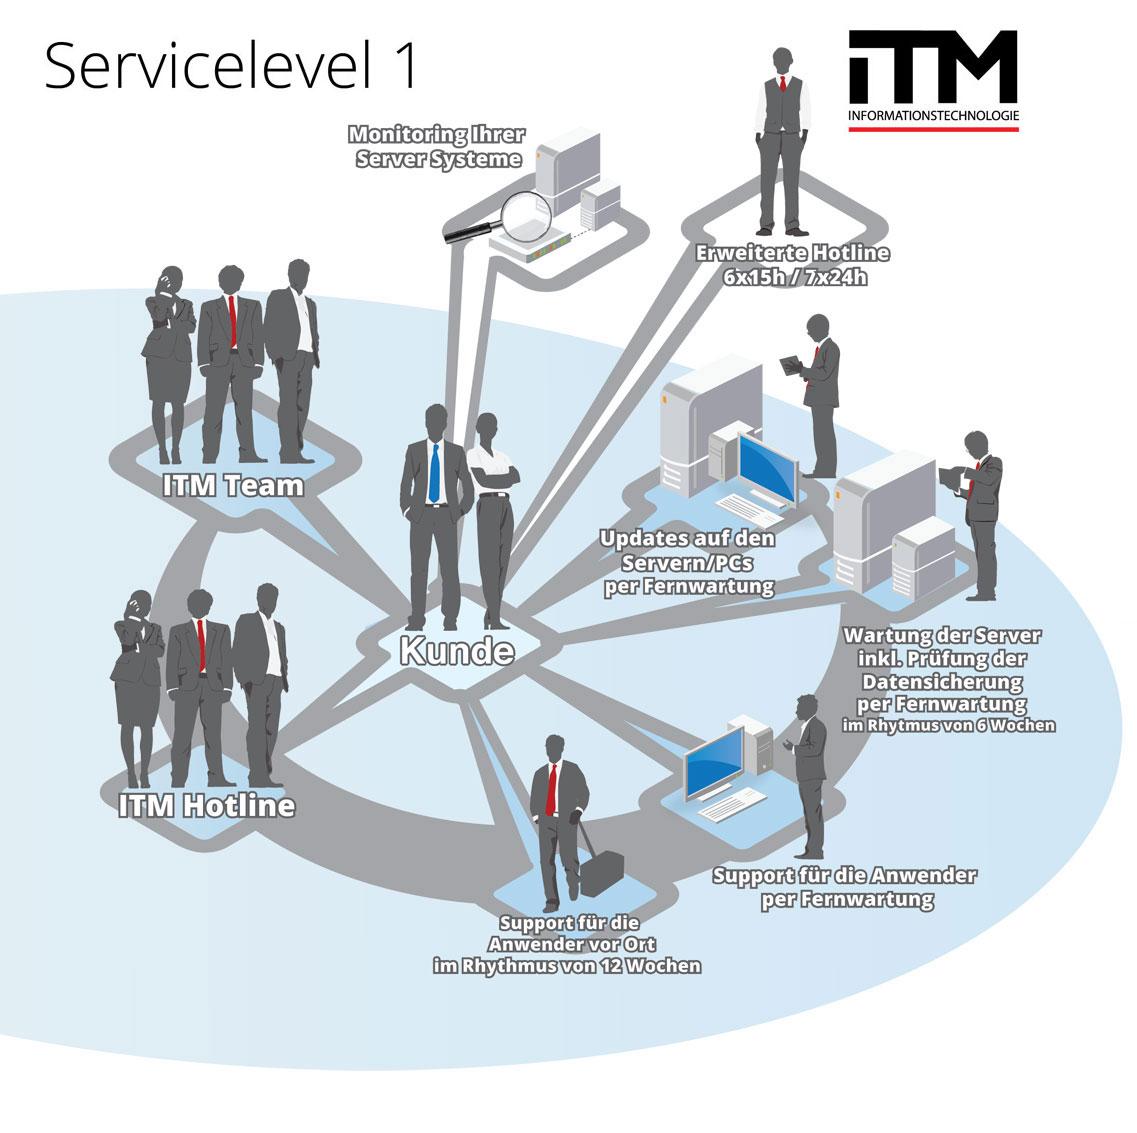 service-level-1